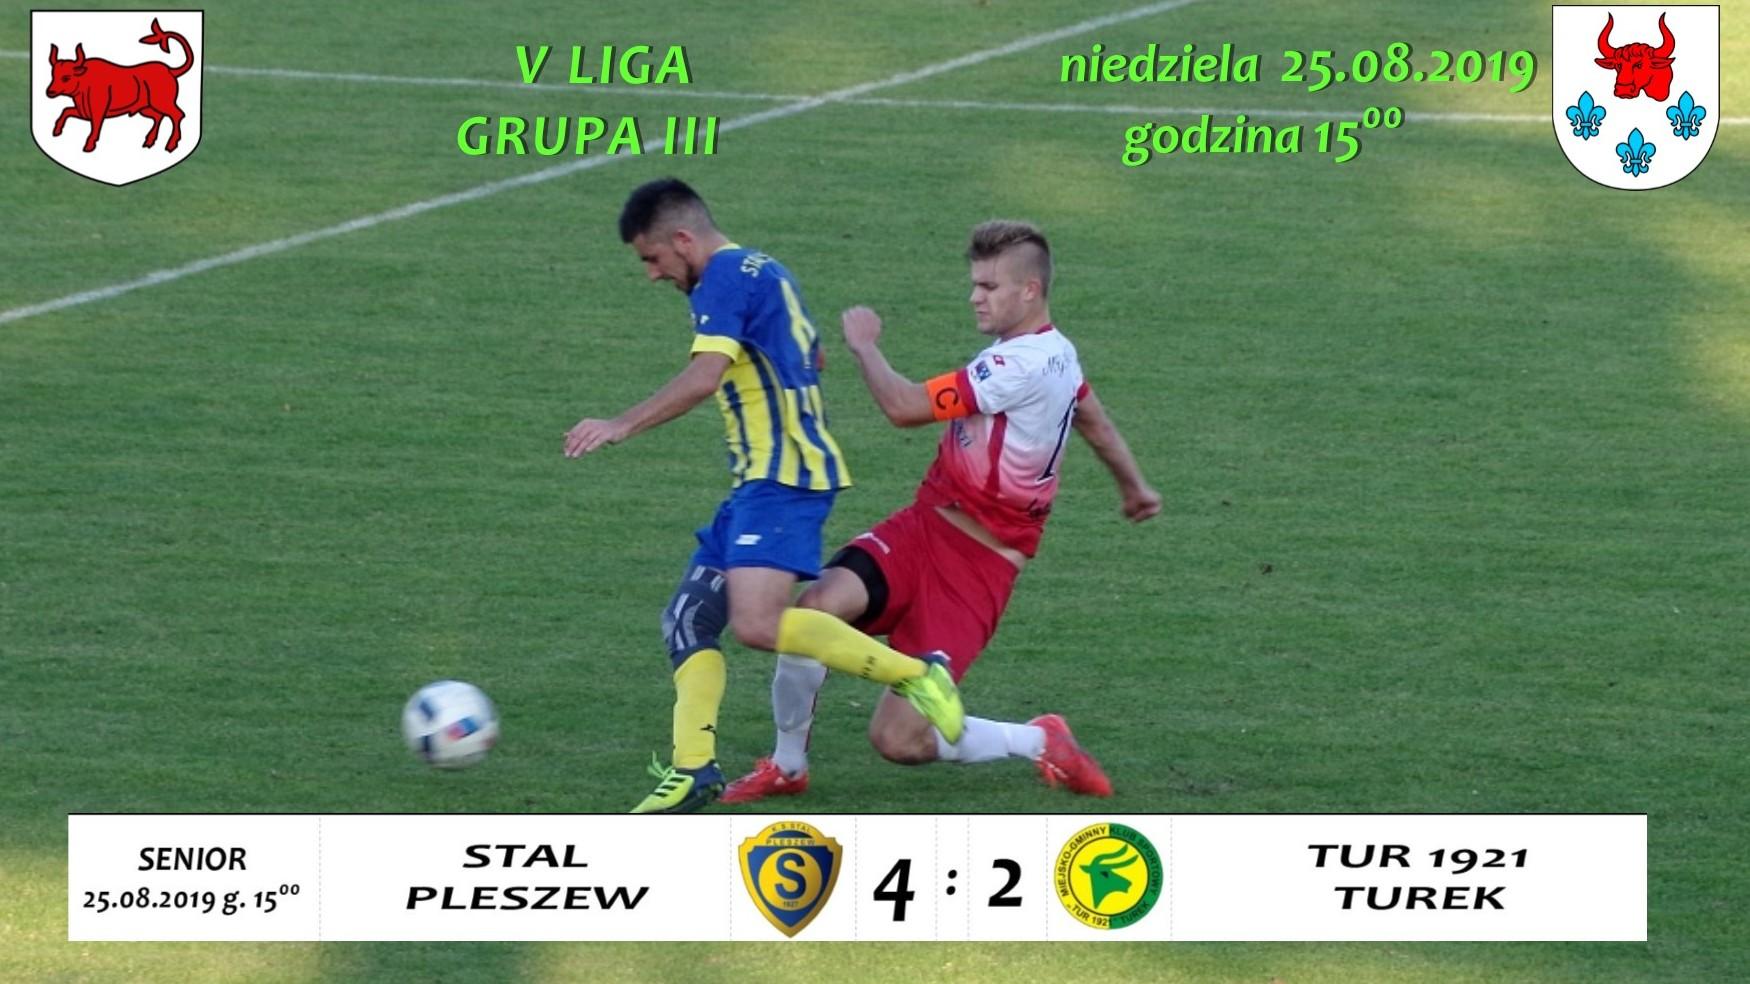 Stal Pleszew- Tur 1921 Turek 4:2, V liga